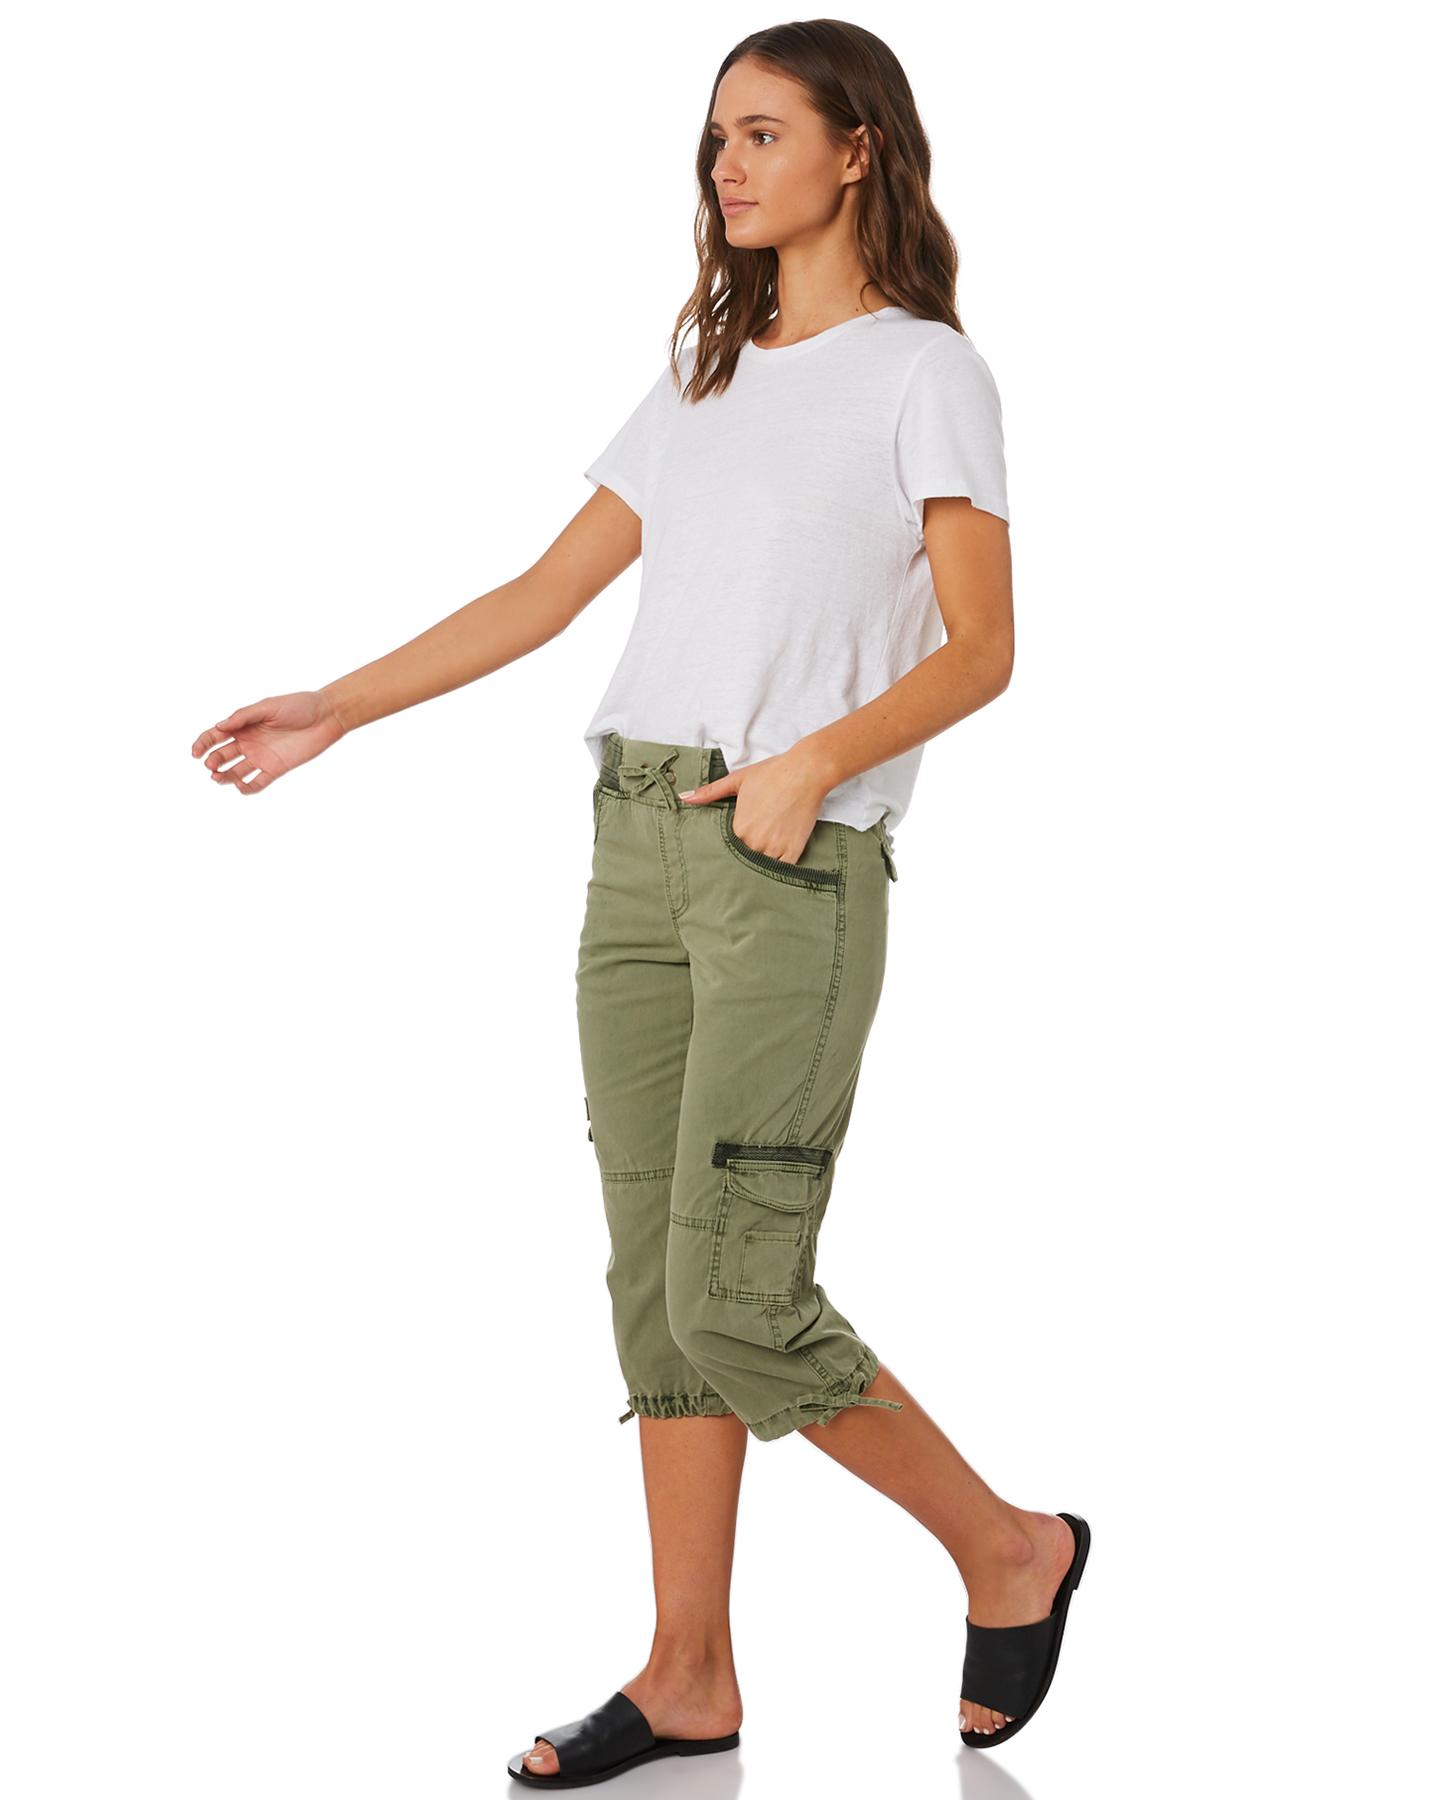 New-Swell-Women-039-s-Mayfair-3-4-Cargo-Pant-Cotton-Green thumbnail 10